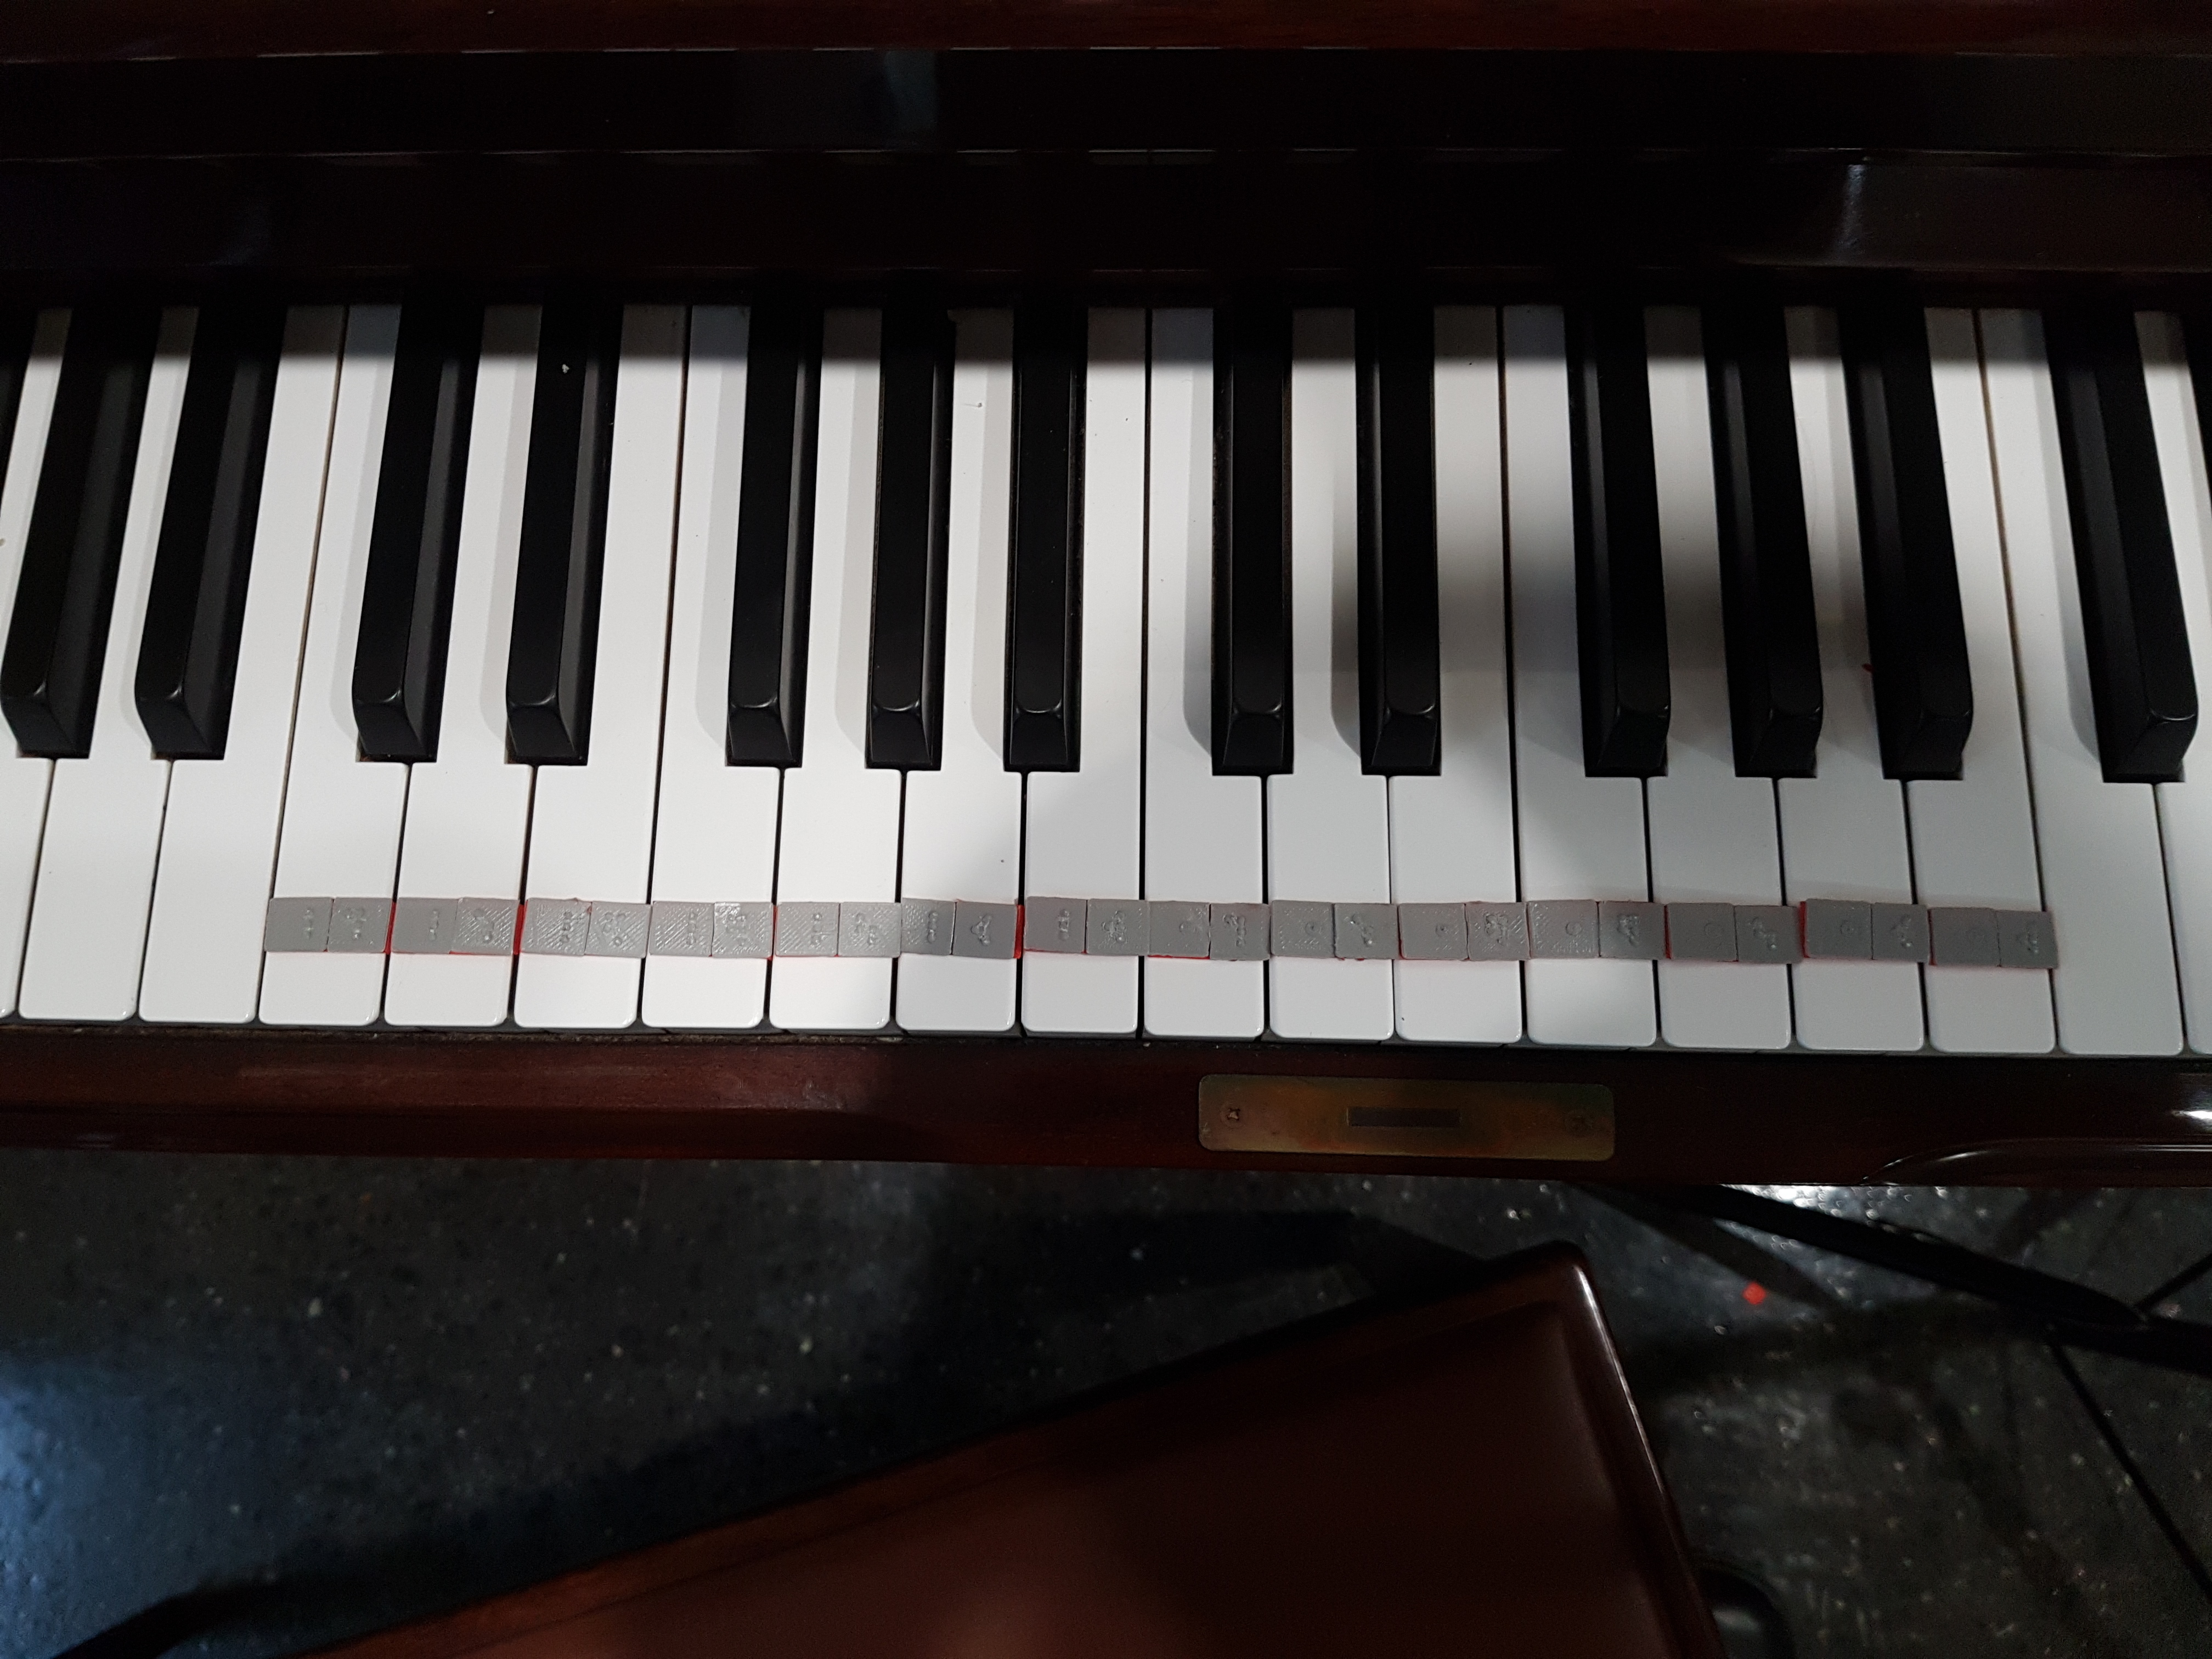 Piano Key Braille